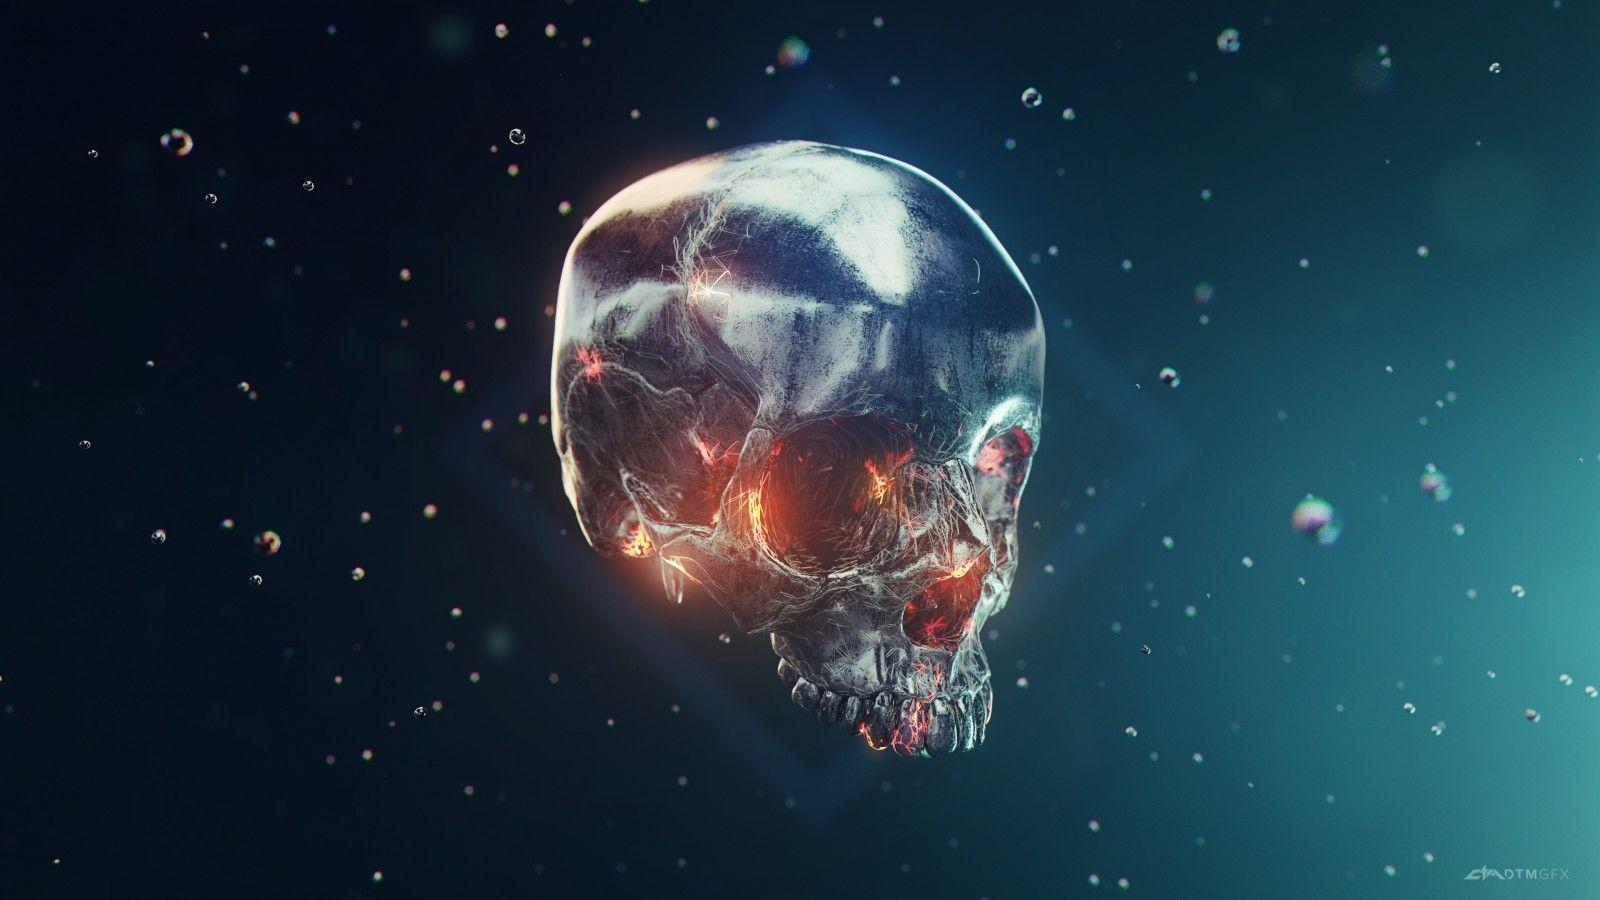 Misc Iron Skull 4k Wallpapers Wallpaper De Tela